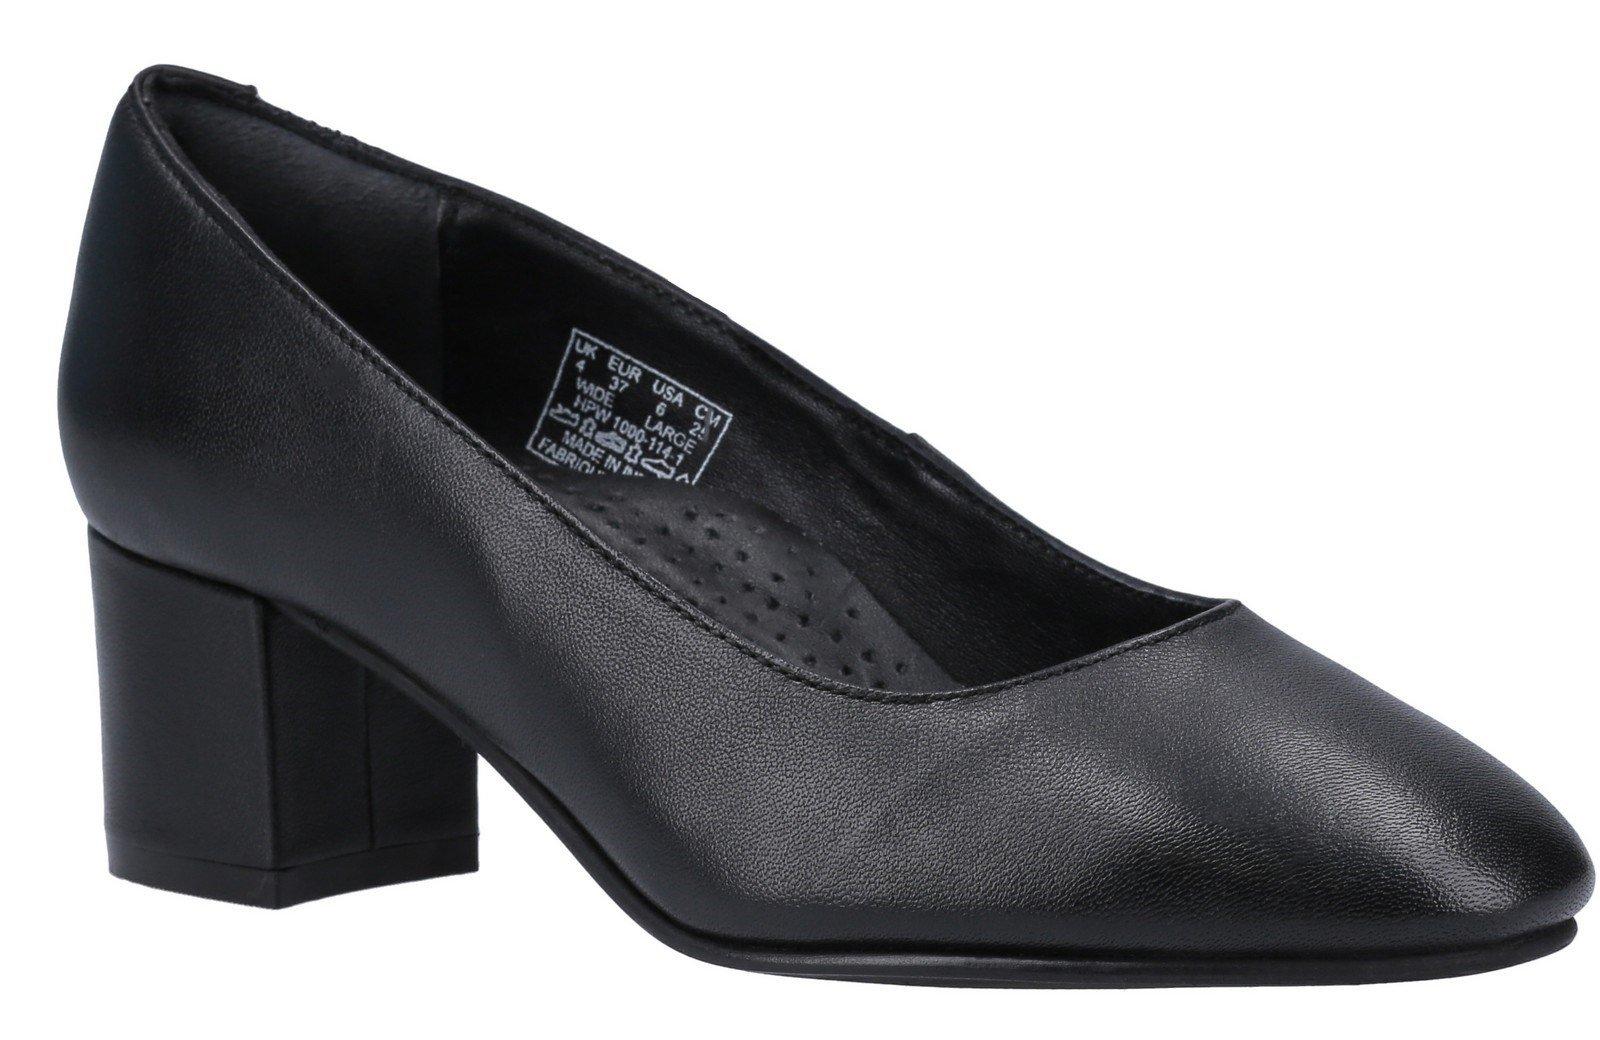 Hush Puppies Women's Anna Slip On Court Shoe Various Colours 30217 - Black 3